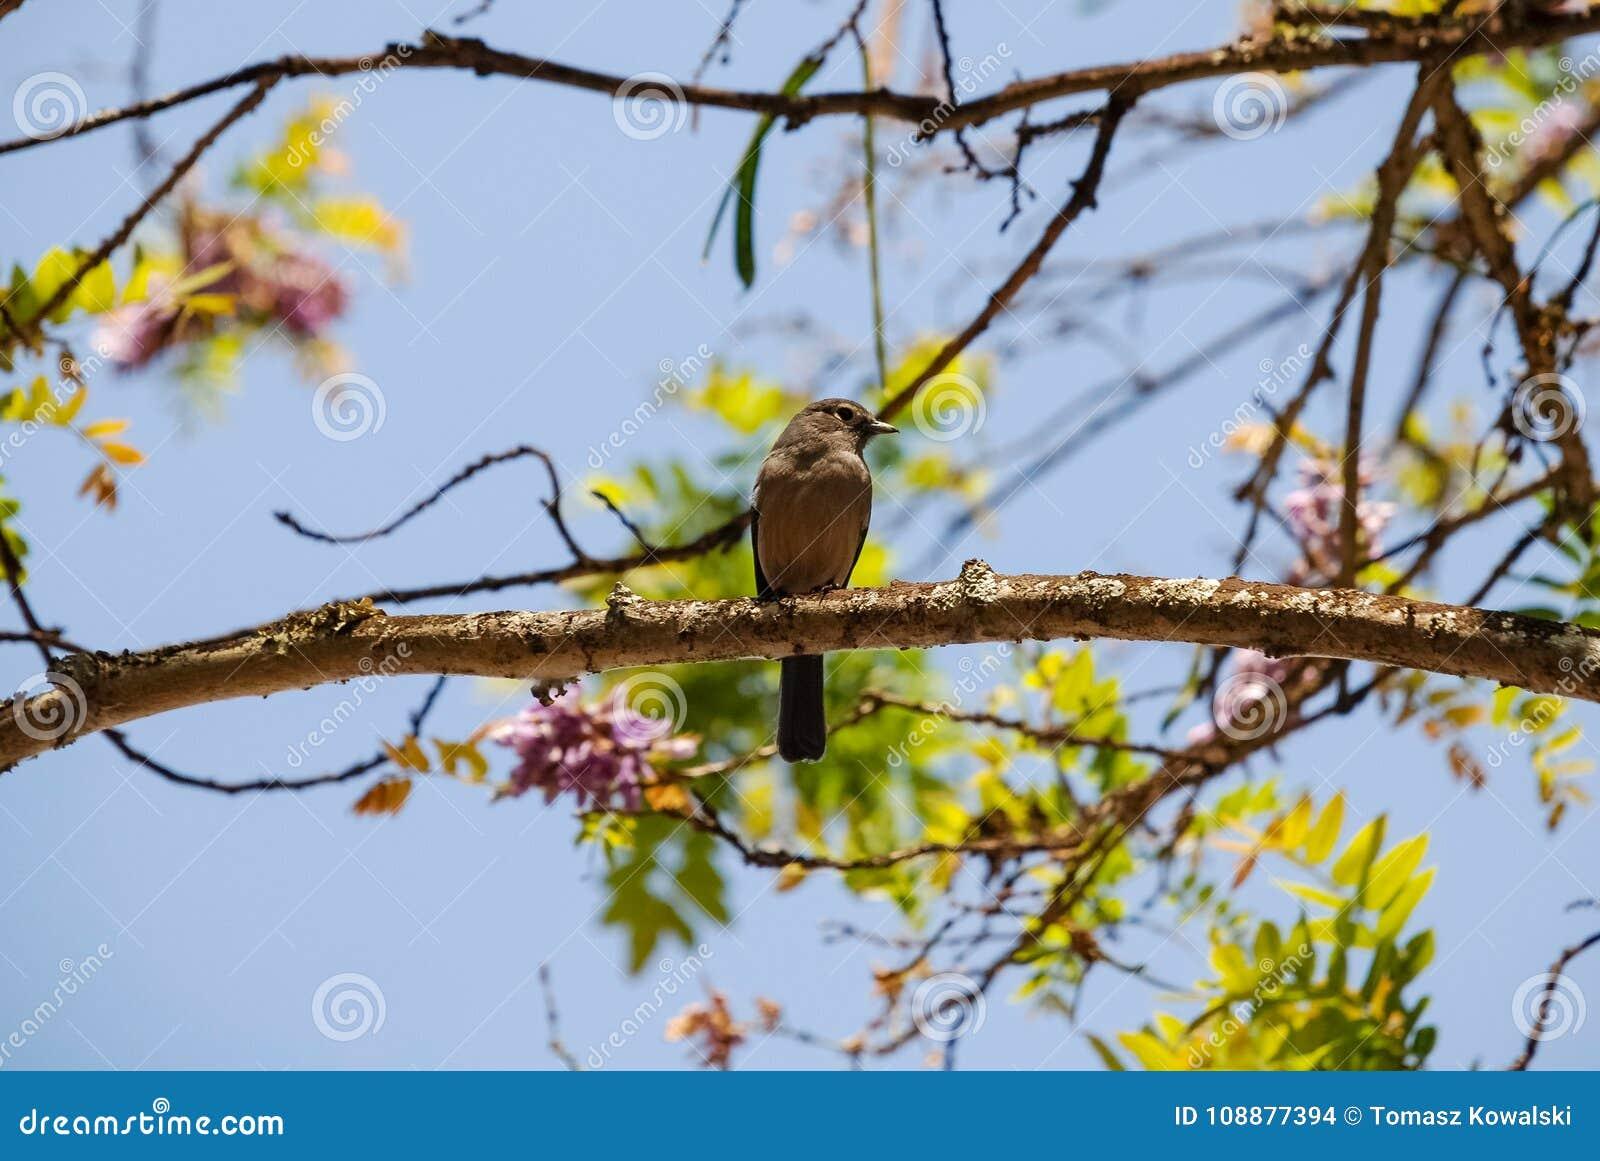 Uccello Kenya Africa di chiacchierata di Moorland